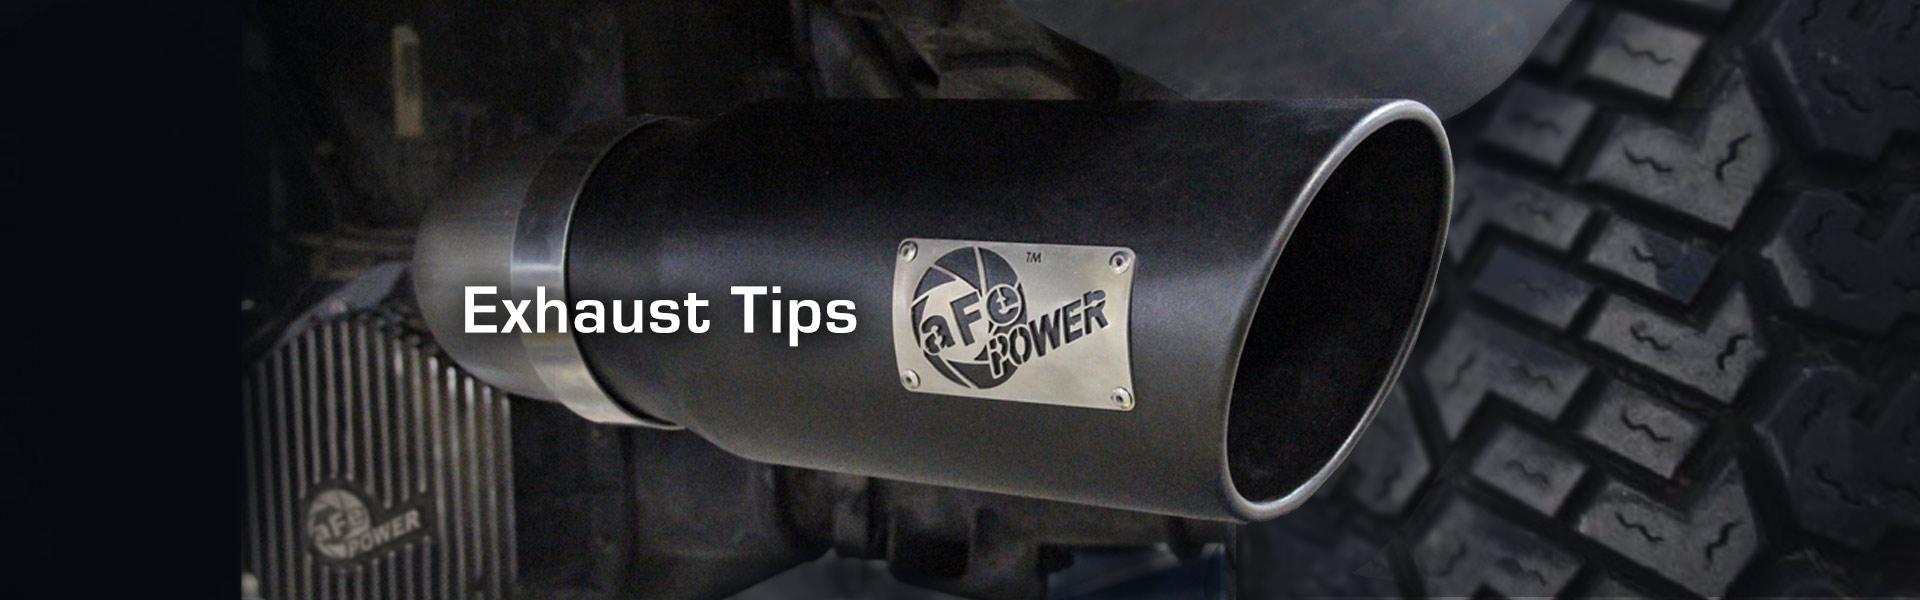 exhaust tips universal diesel gas